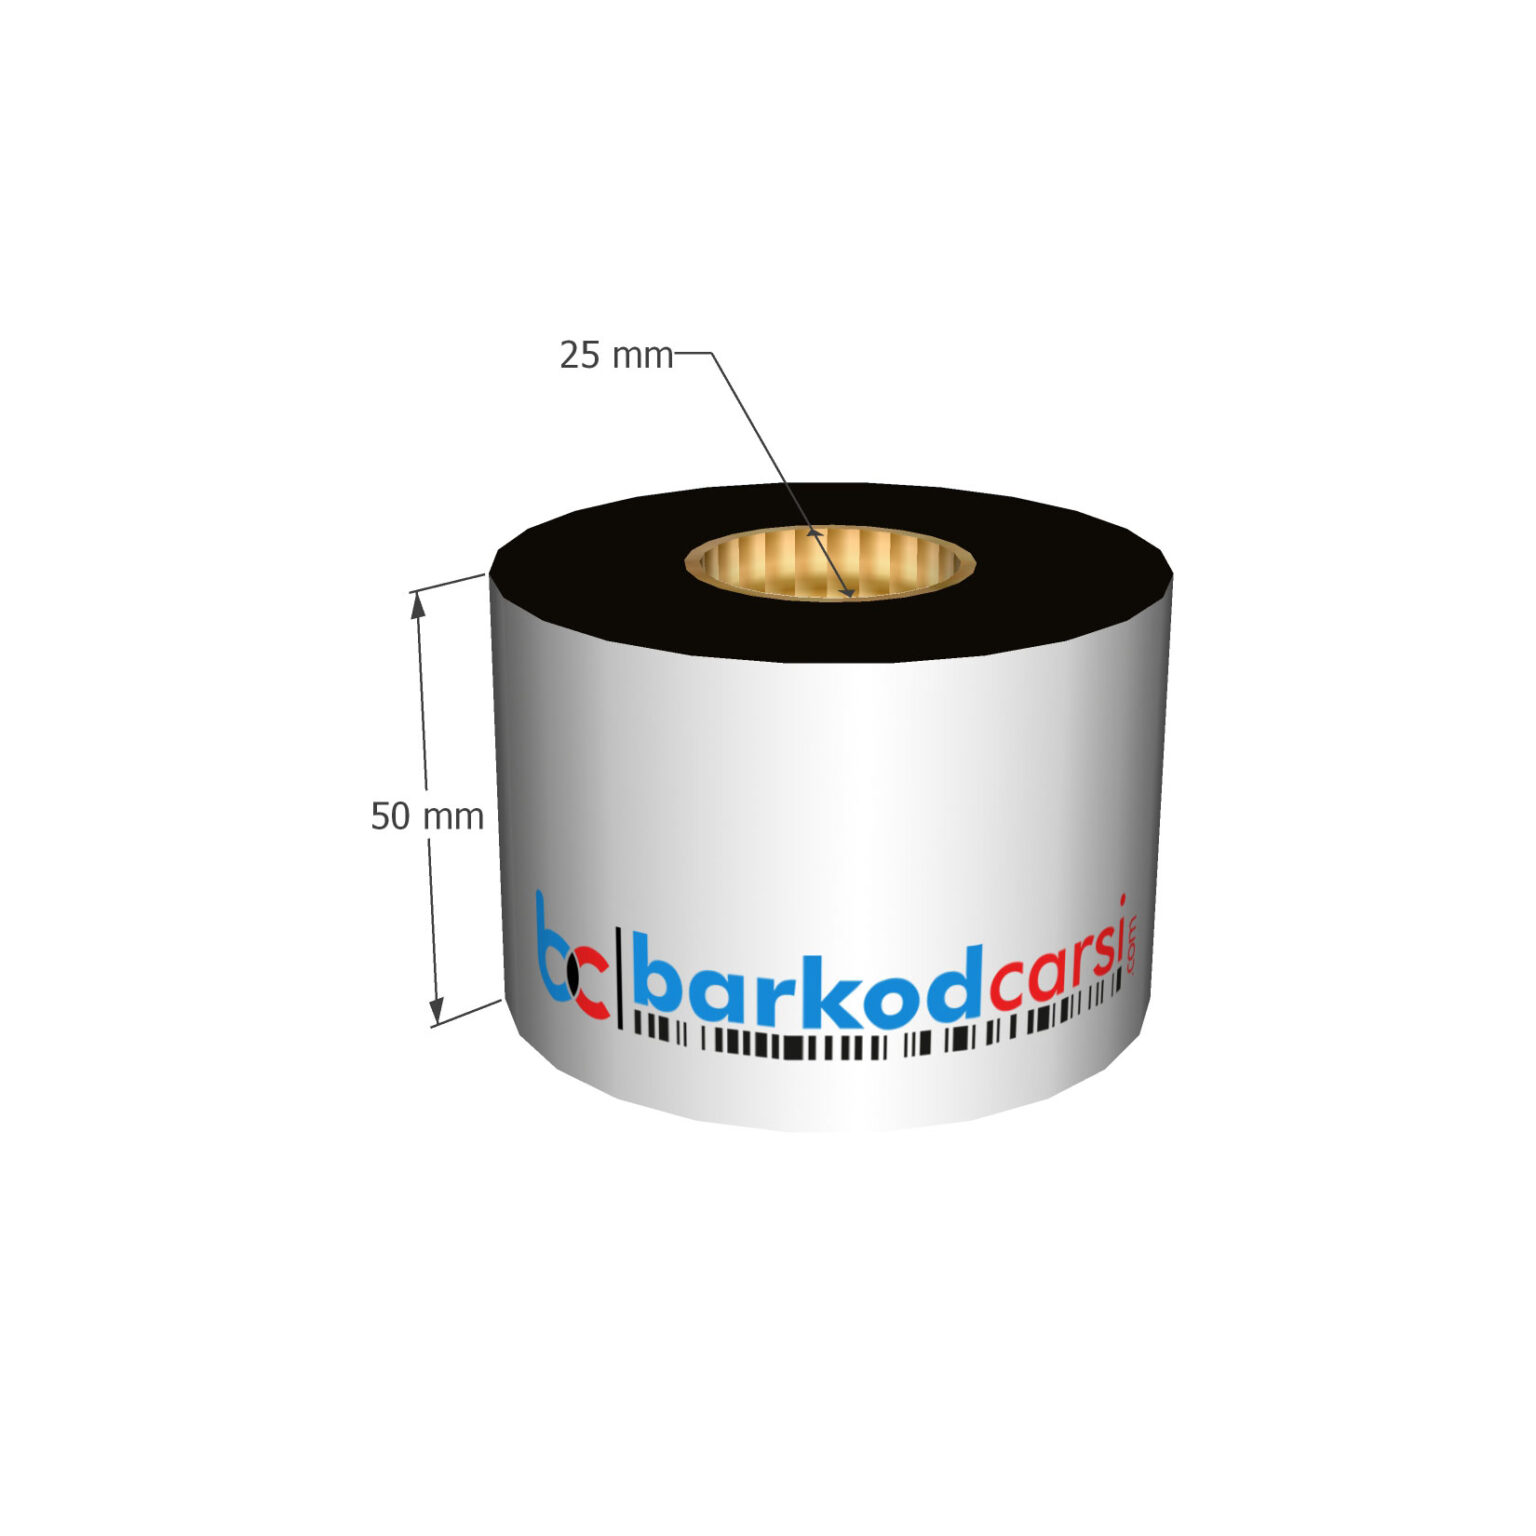 50x300 mt Wax / Wax-Resin / Resin / Hot-Foil Ribon Çeşitleri By BarkodCarsi.com